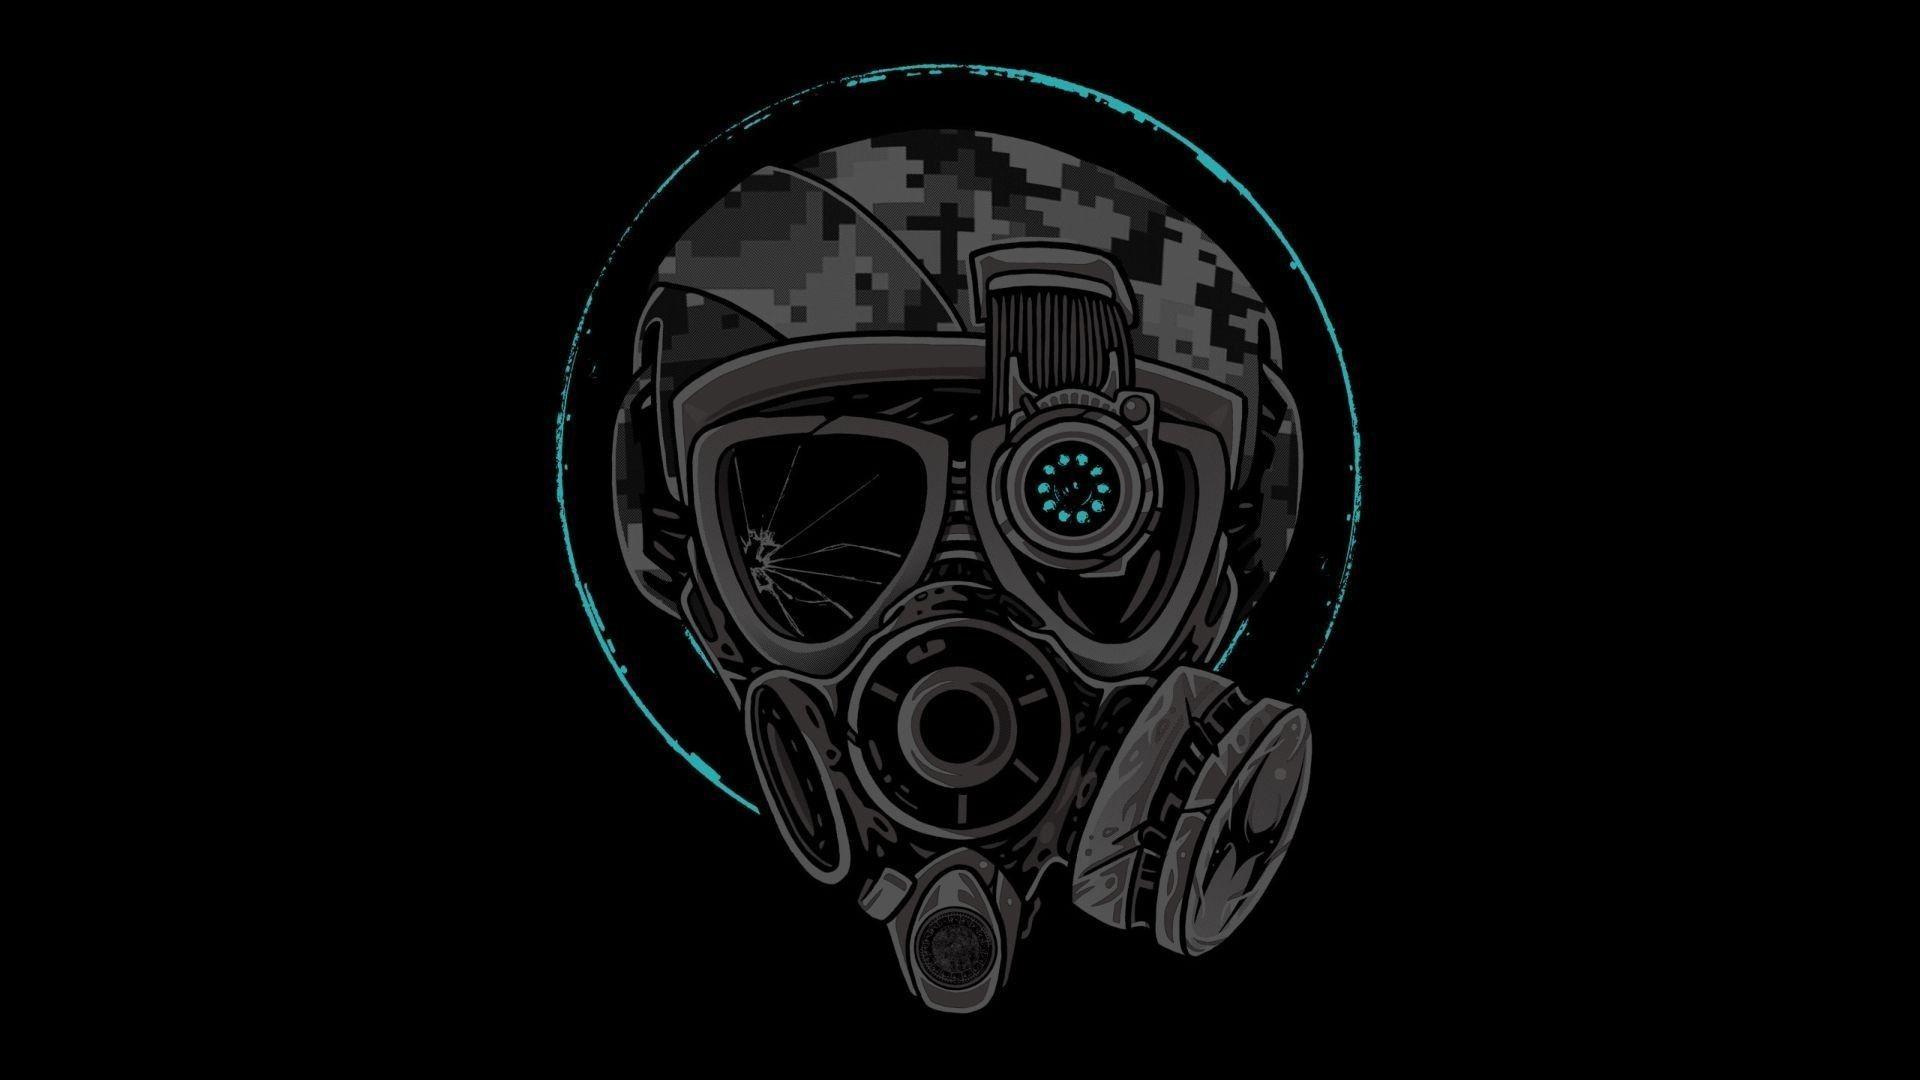 Gas GFX artwork Zeus wallpaper